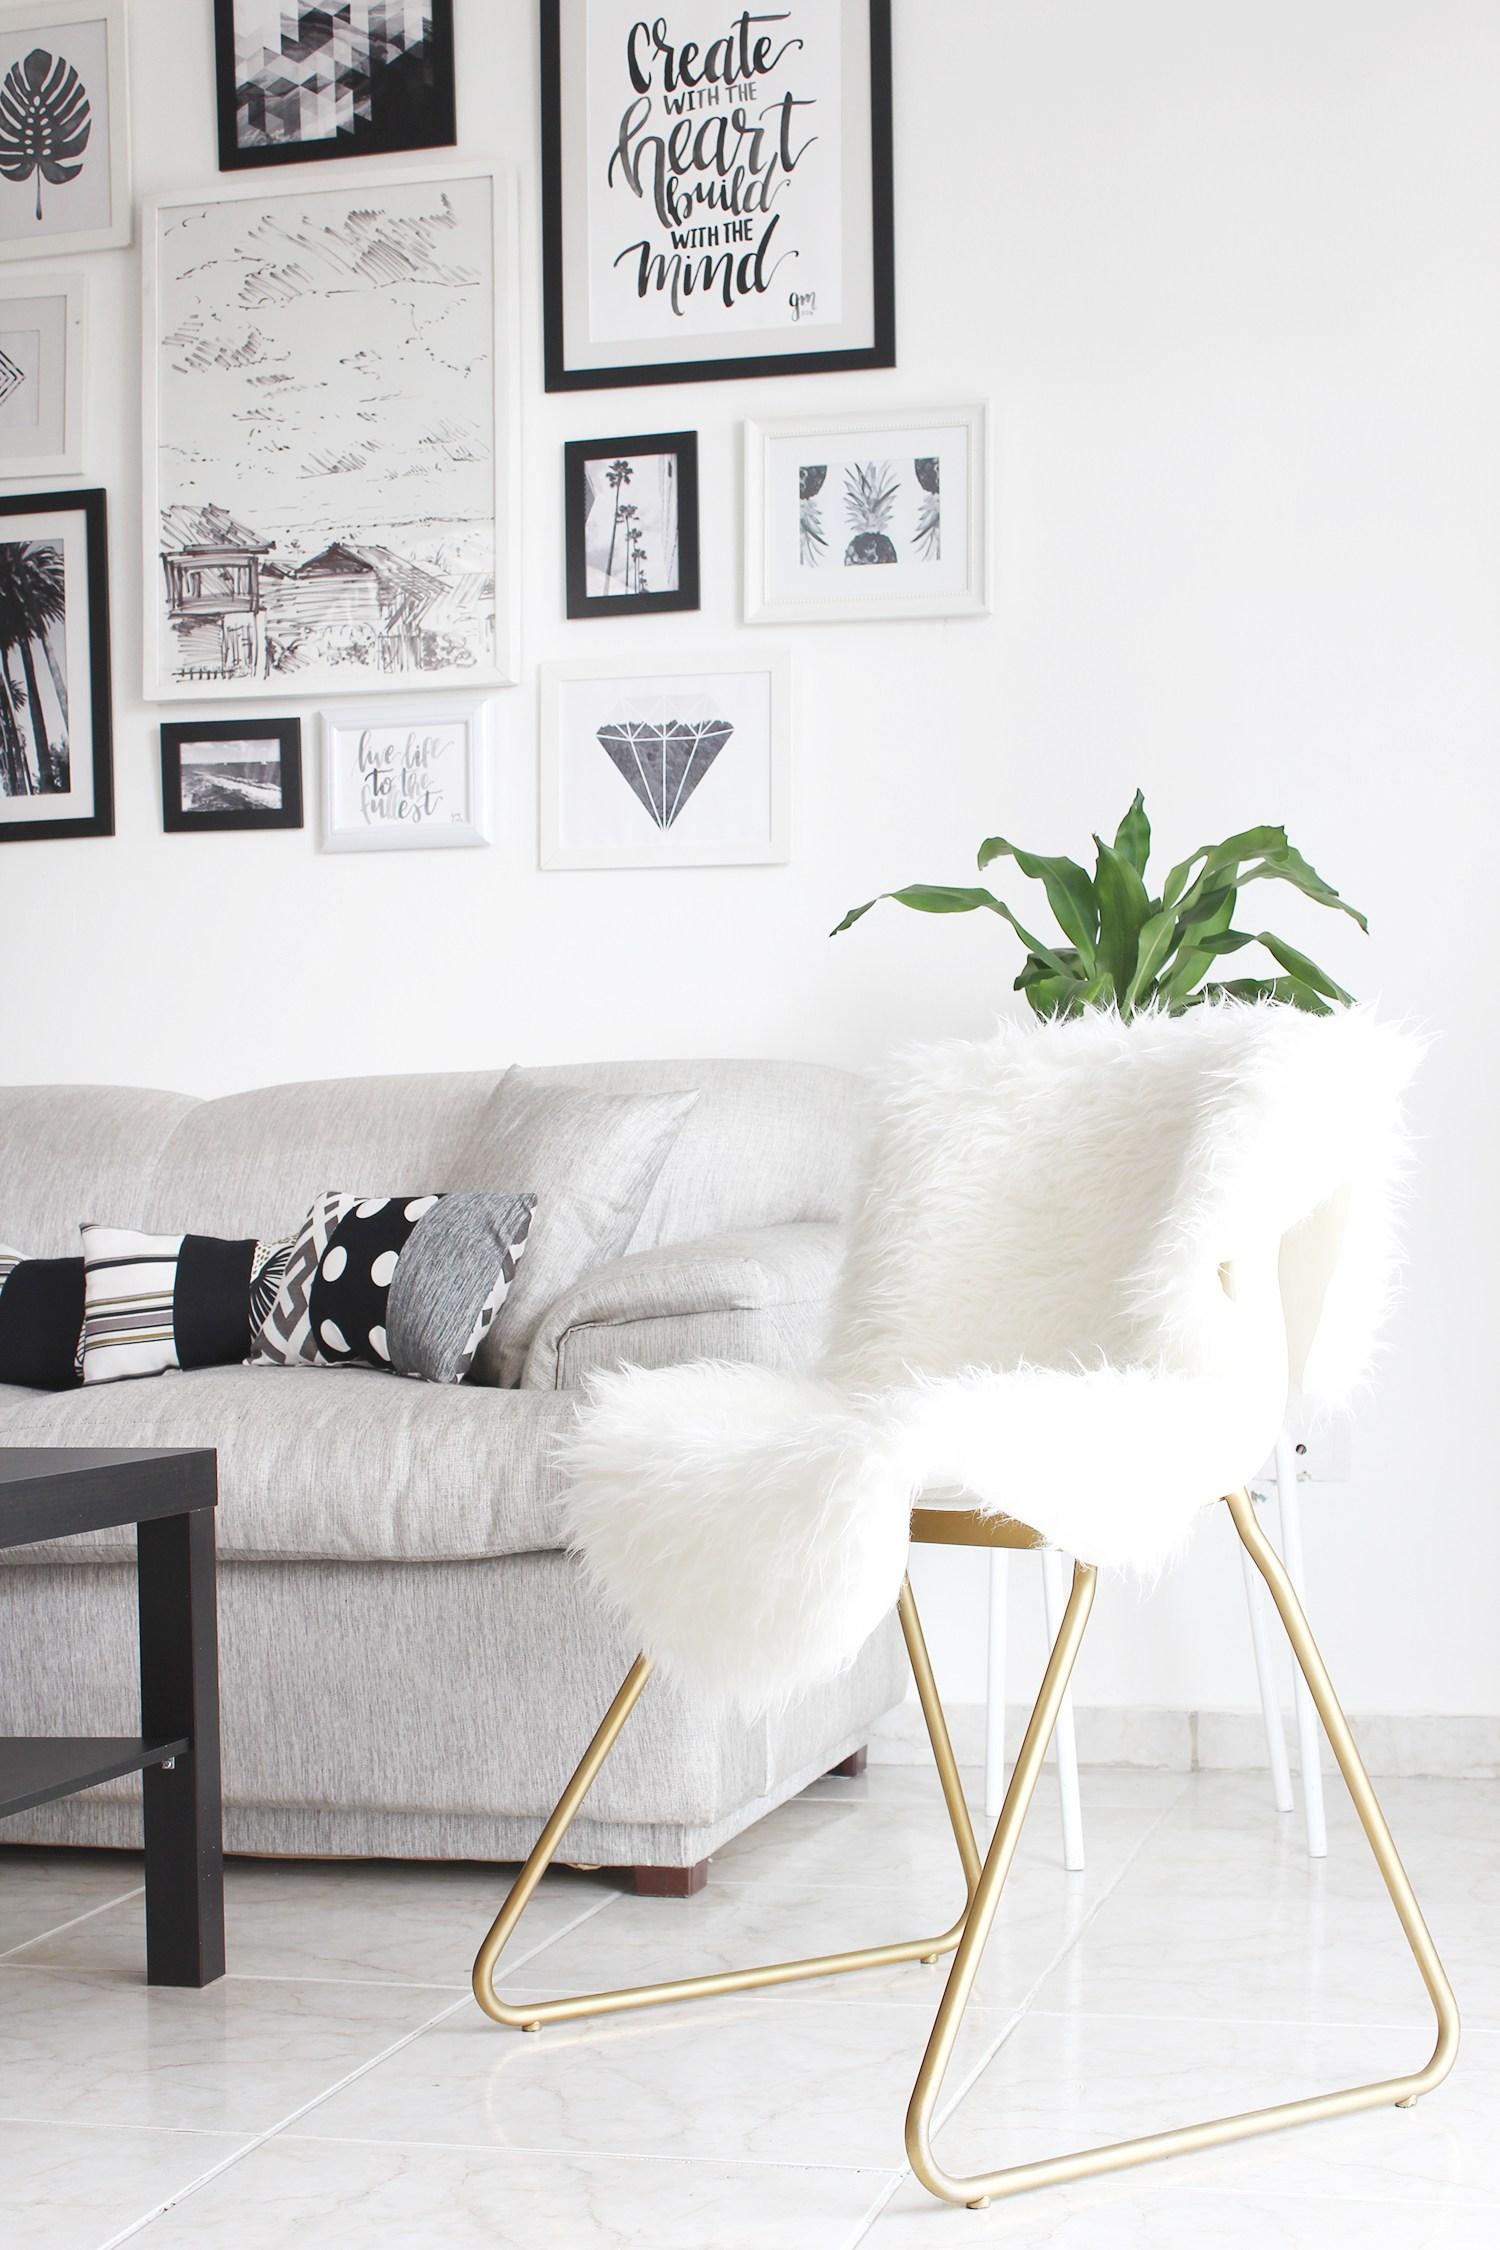 24. Tobias Chair